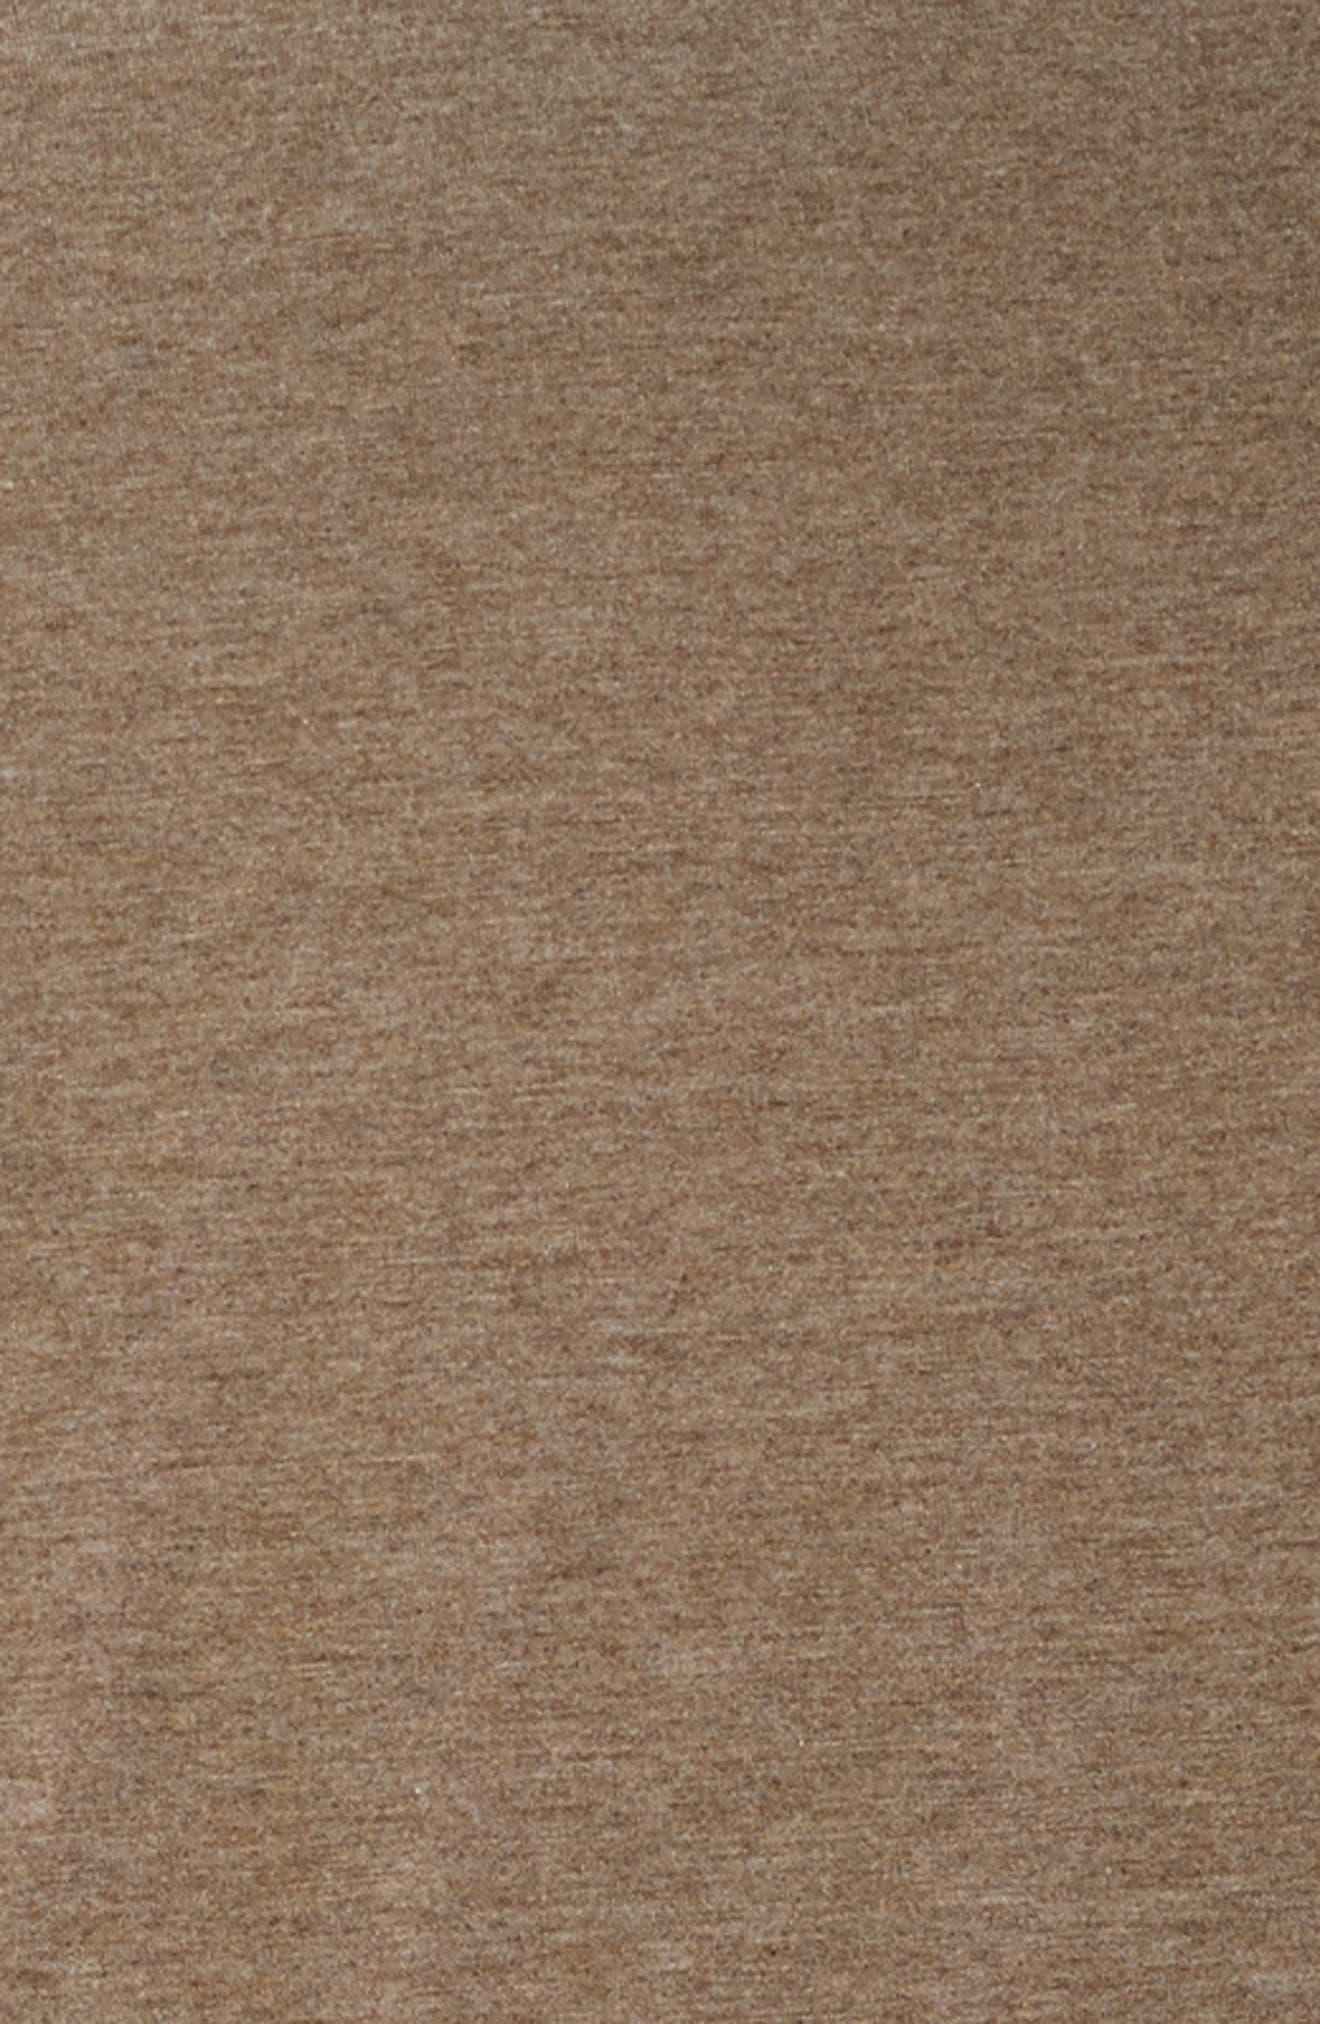 Alternate Image 3  - Calvin Klein Home Cotton & Modal Jersey Duvet Cover